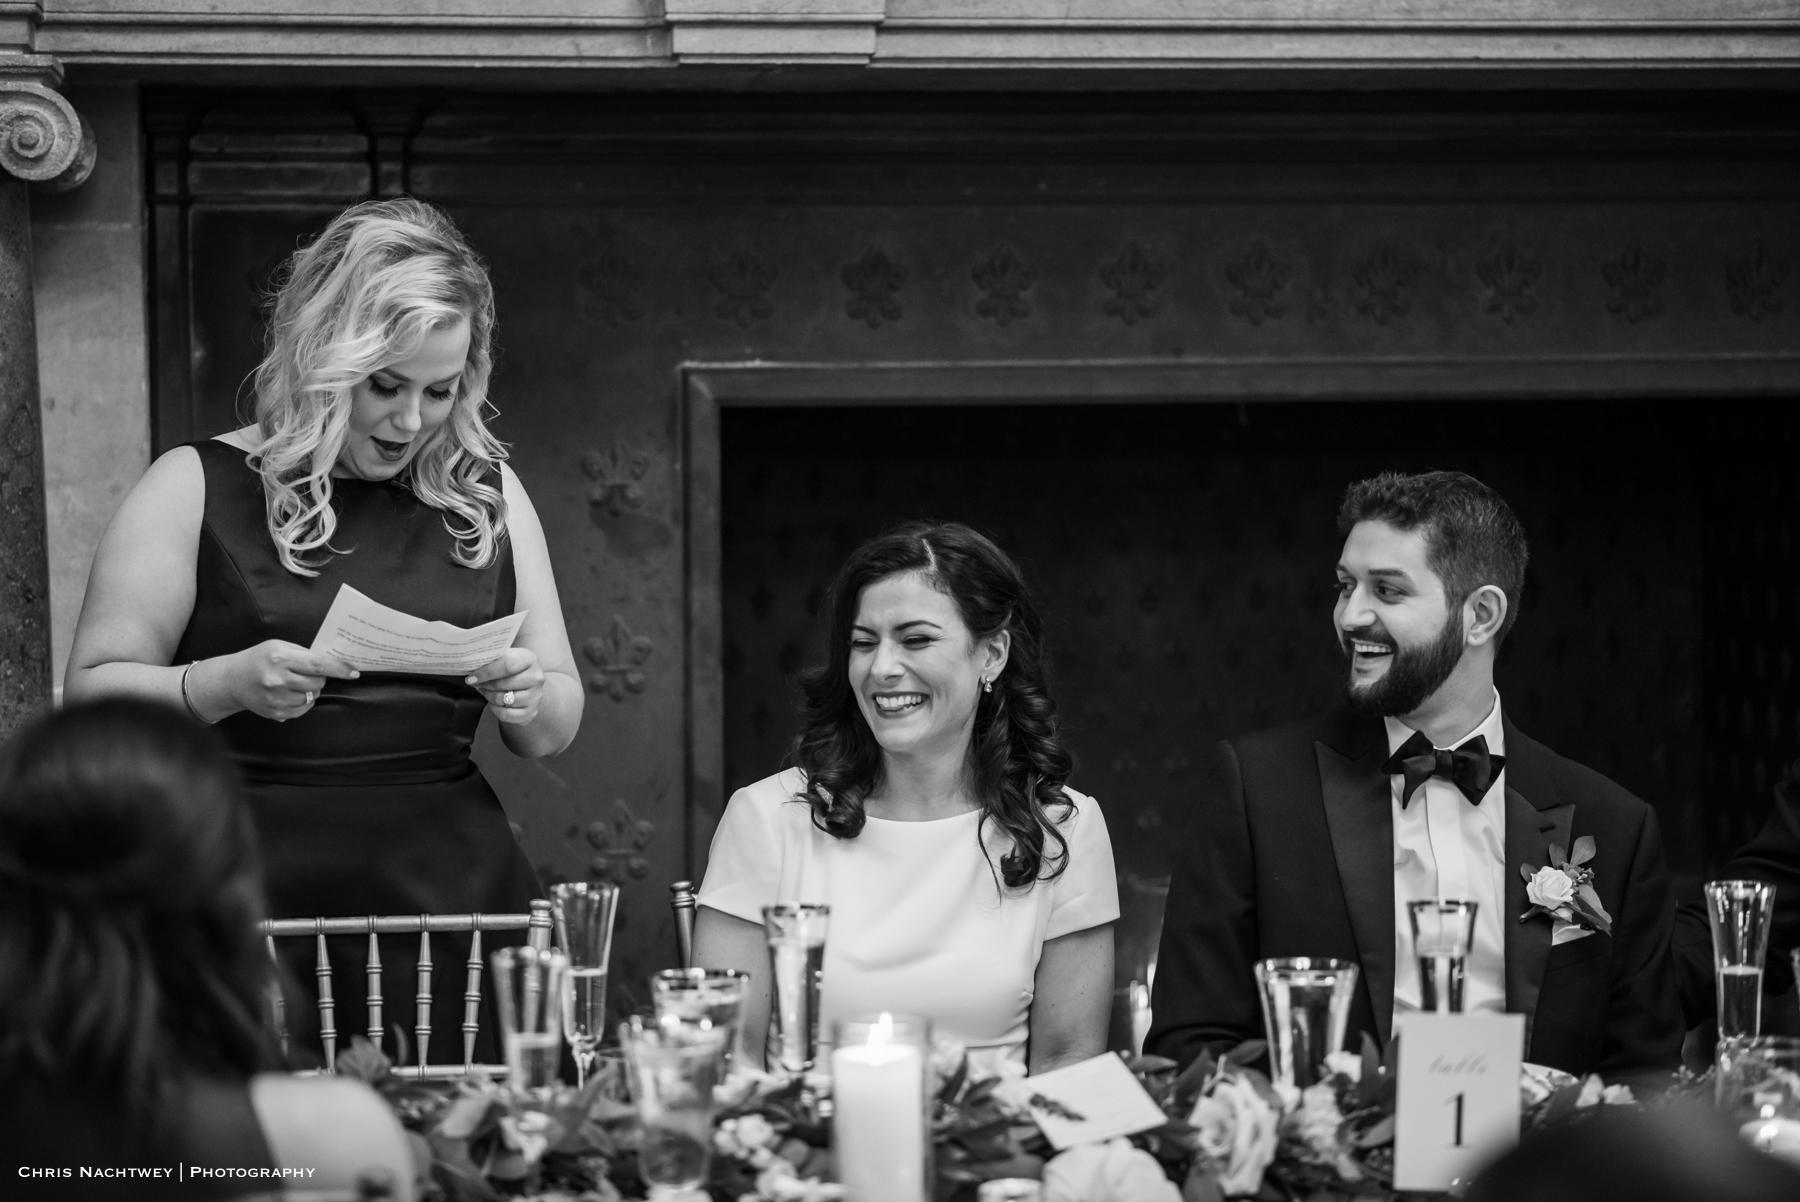 winter-branford-house-wedding-photos-groton-ct-chris-nachtwey-photography-2019-38.jpg